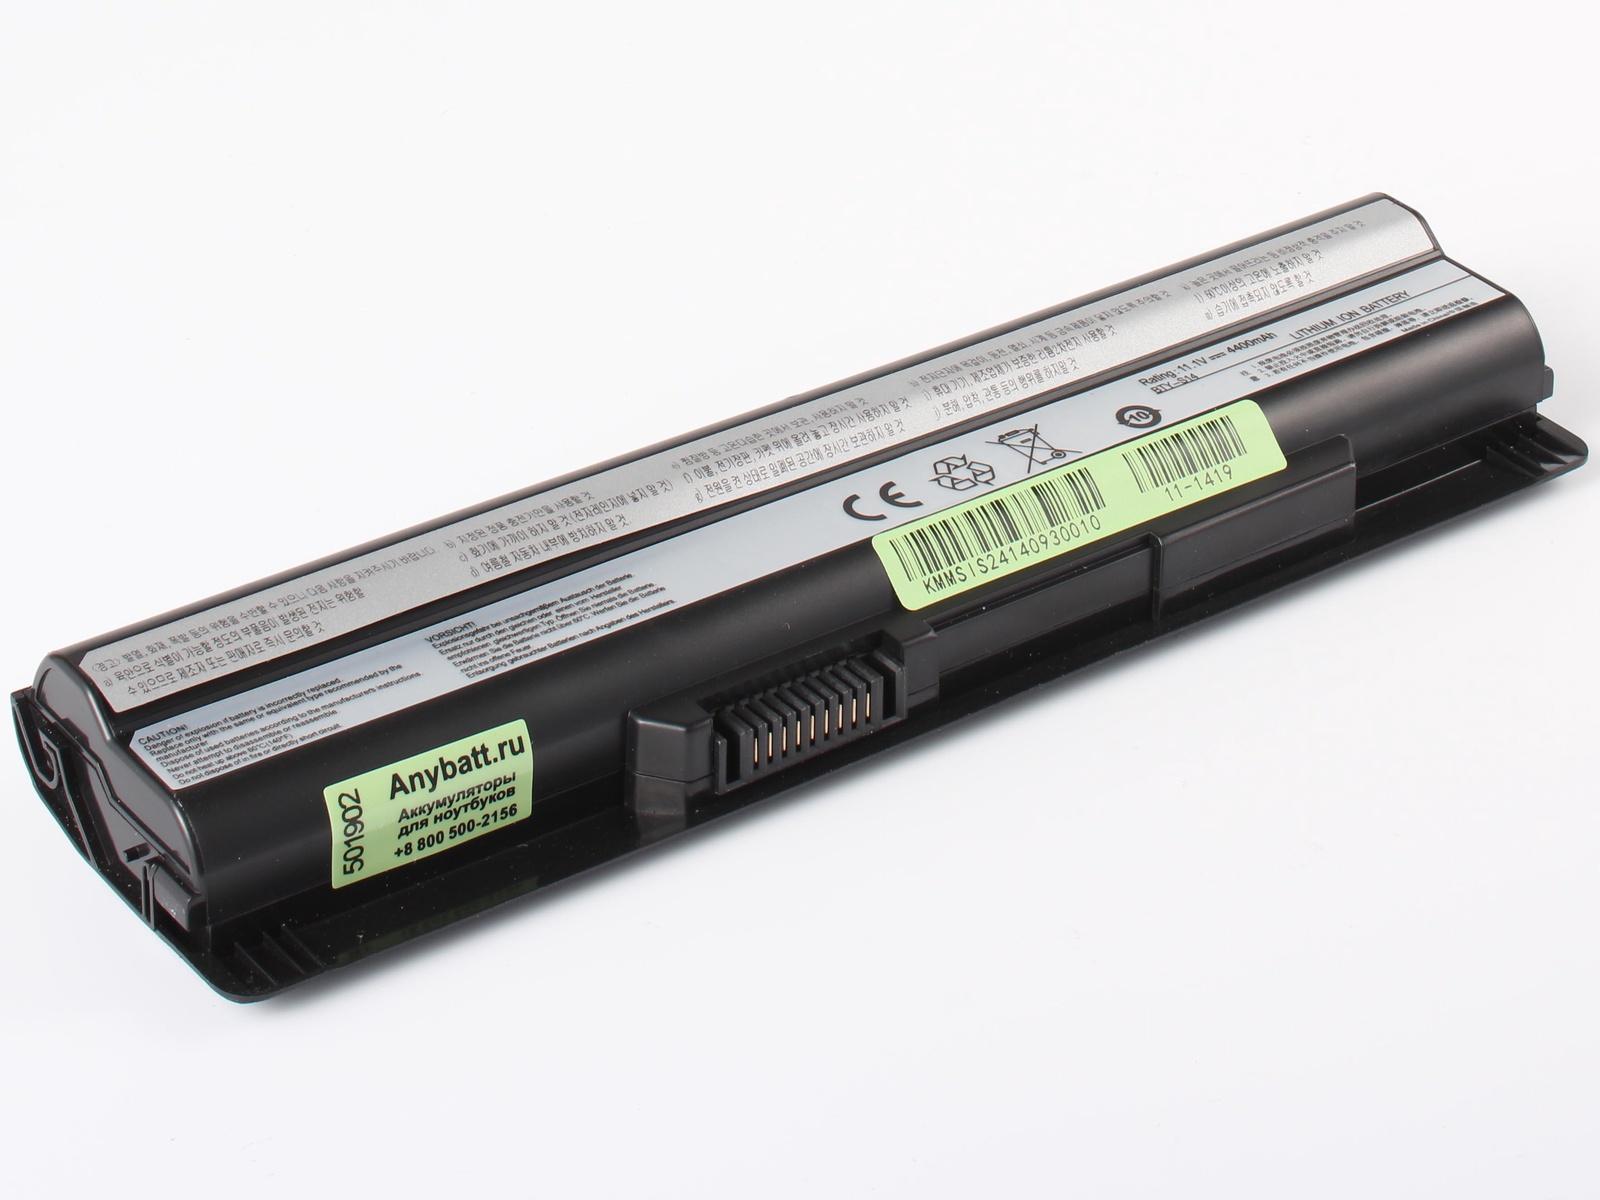 Аккумулятор для ноутбука AnyBatt для MSI FX620, GE60 0NC-009, GP70 2PE-013, CX70 2OD-001, GE60 2OC-201RU, MS-1482, CX61 0OC, FX420, GE60 2PL-467X, GE60 2QD, GE70 2PC-282, GP70 Series, Megabook GE700, CX61 0OC-848RU, GE70 2PL-029 аккумулятор для ноутбука anybatt для msi ms 16g4 ge60 2pf fx620dx gp70 2od ge70 2od cr70 2m cx61 0nc fx610mx ge60 2qe cx70 0nd gp70 2qe fr400 fr610 ge70 2qd cx70 0nf 210 gp70 2qe leopard cx61 2oc ge60 0nd 478